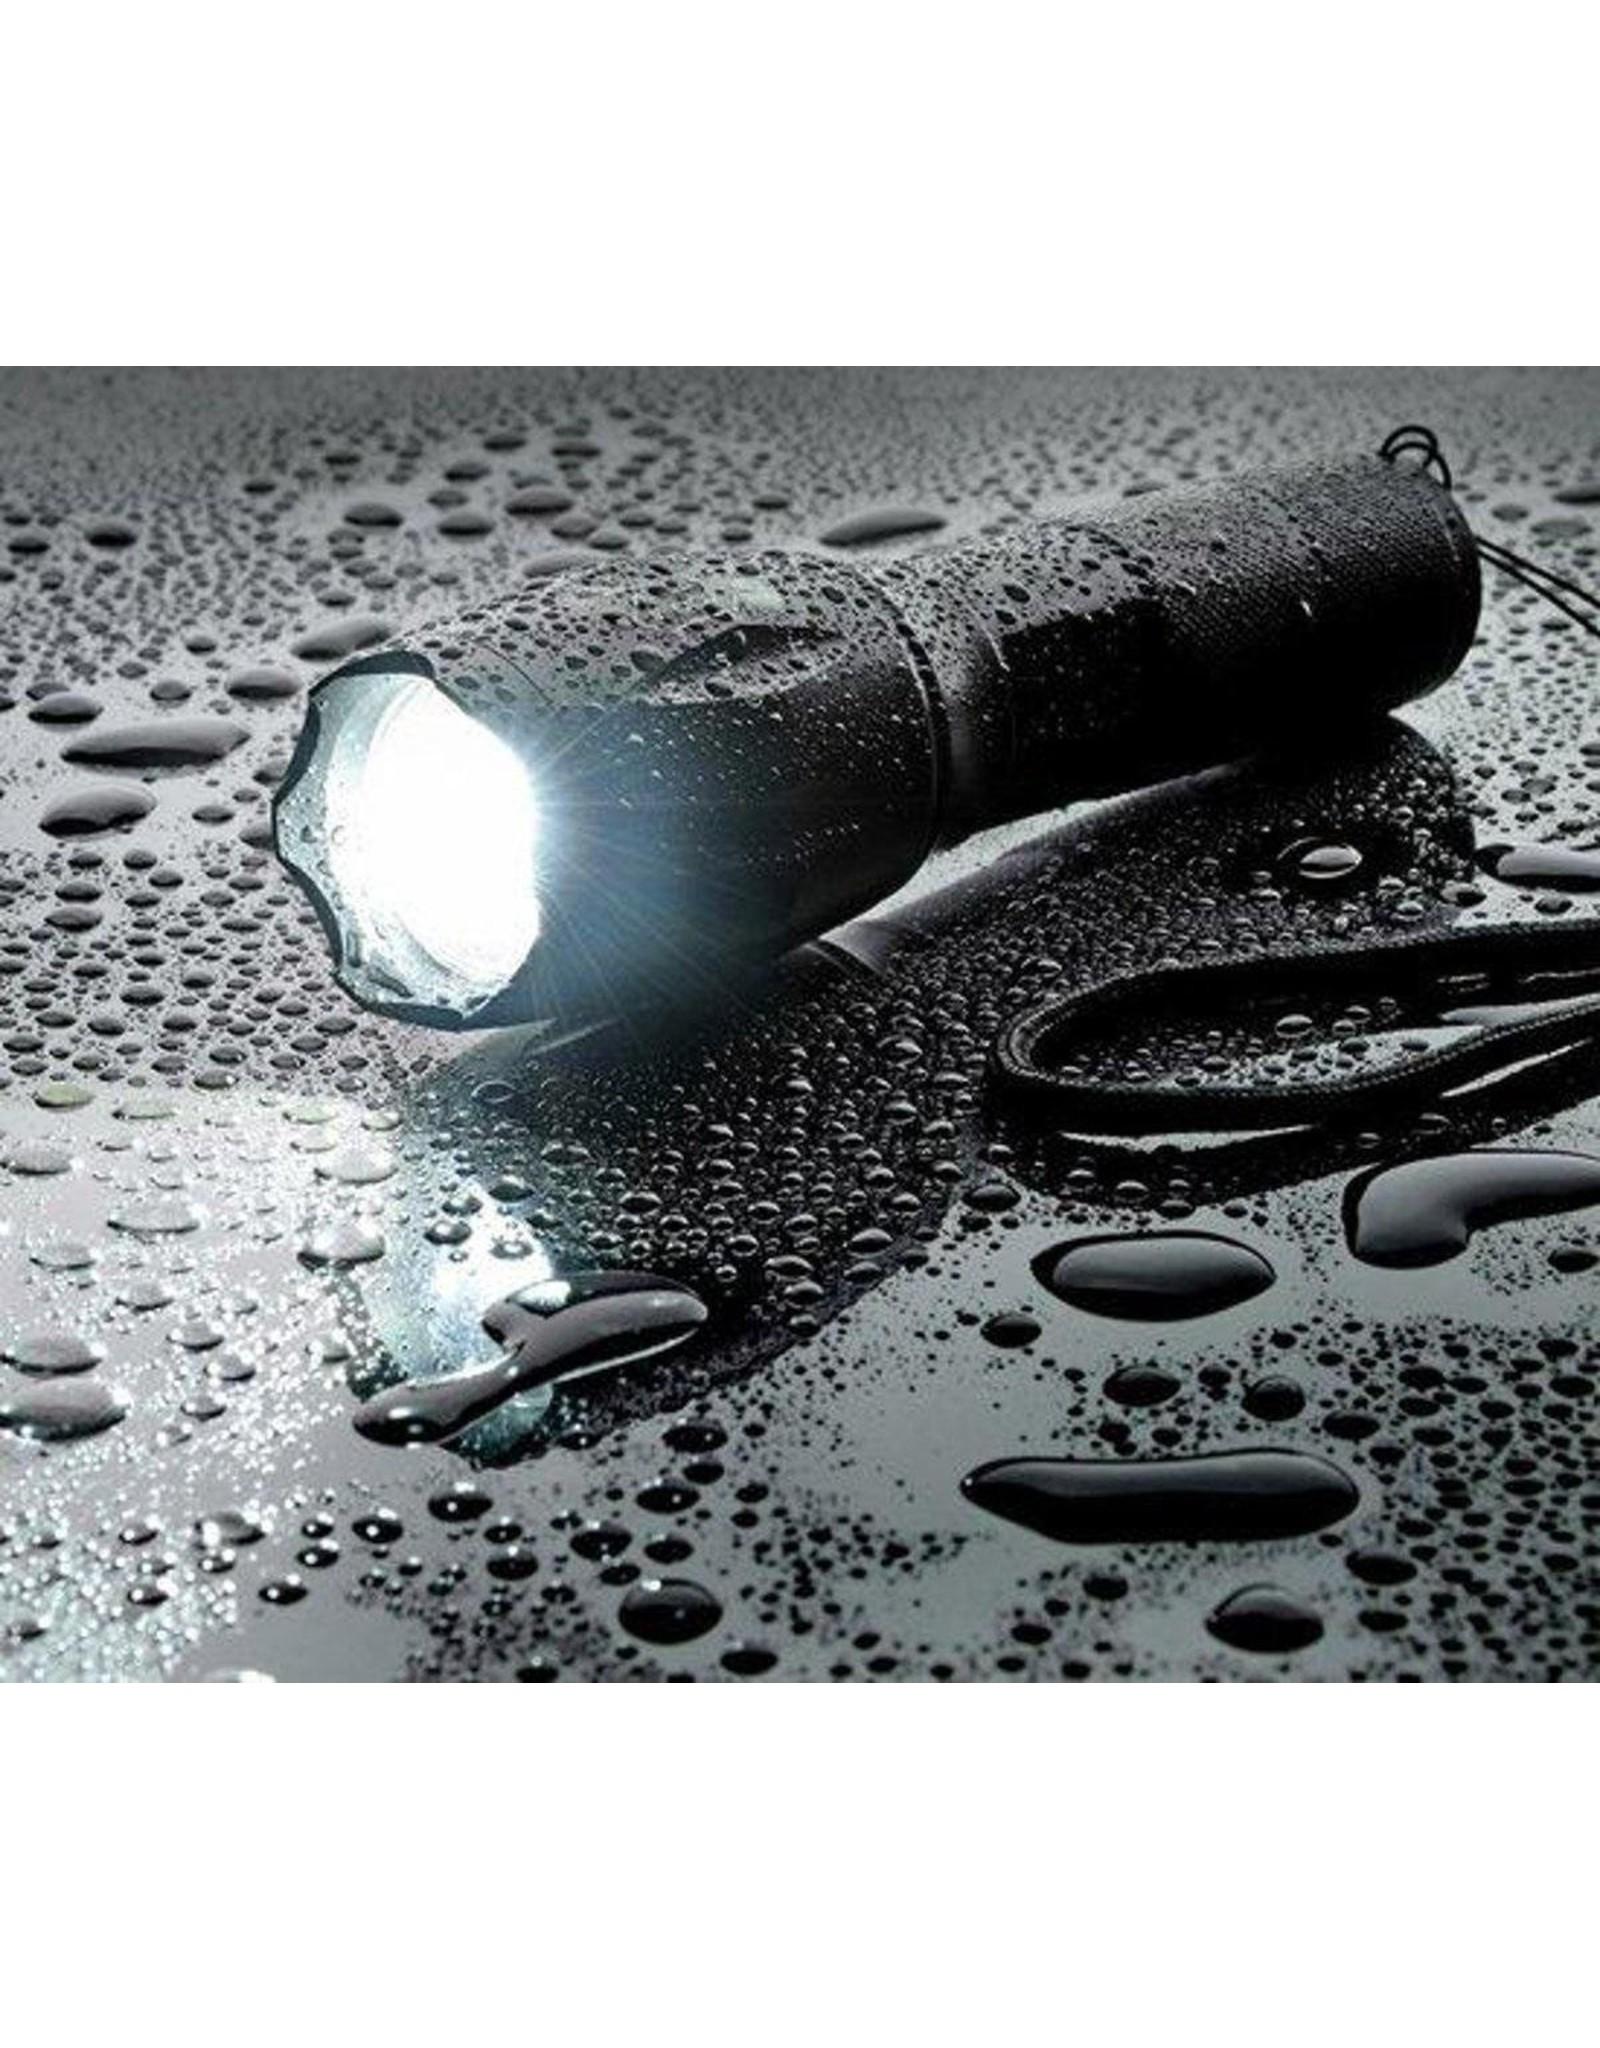 Militaire zaklamp - LED zaklamp - 2000 Lumen - Inzoombaar - 2 stuks